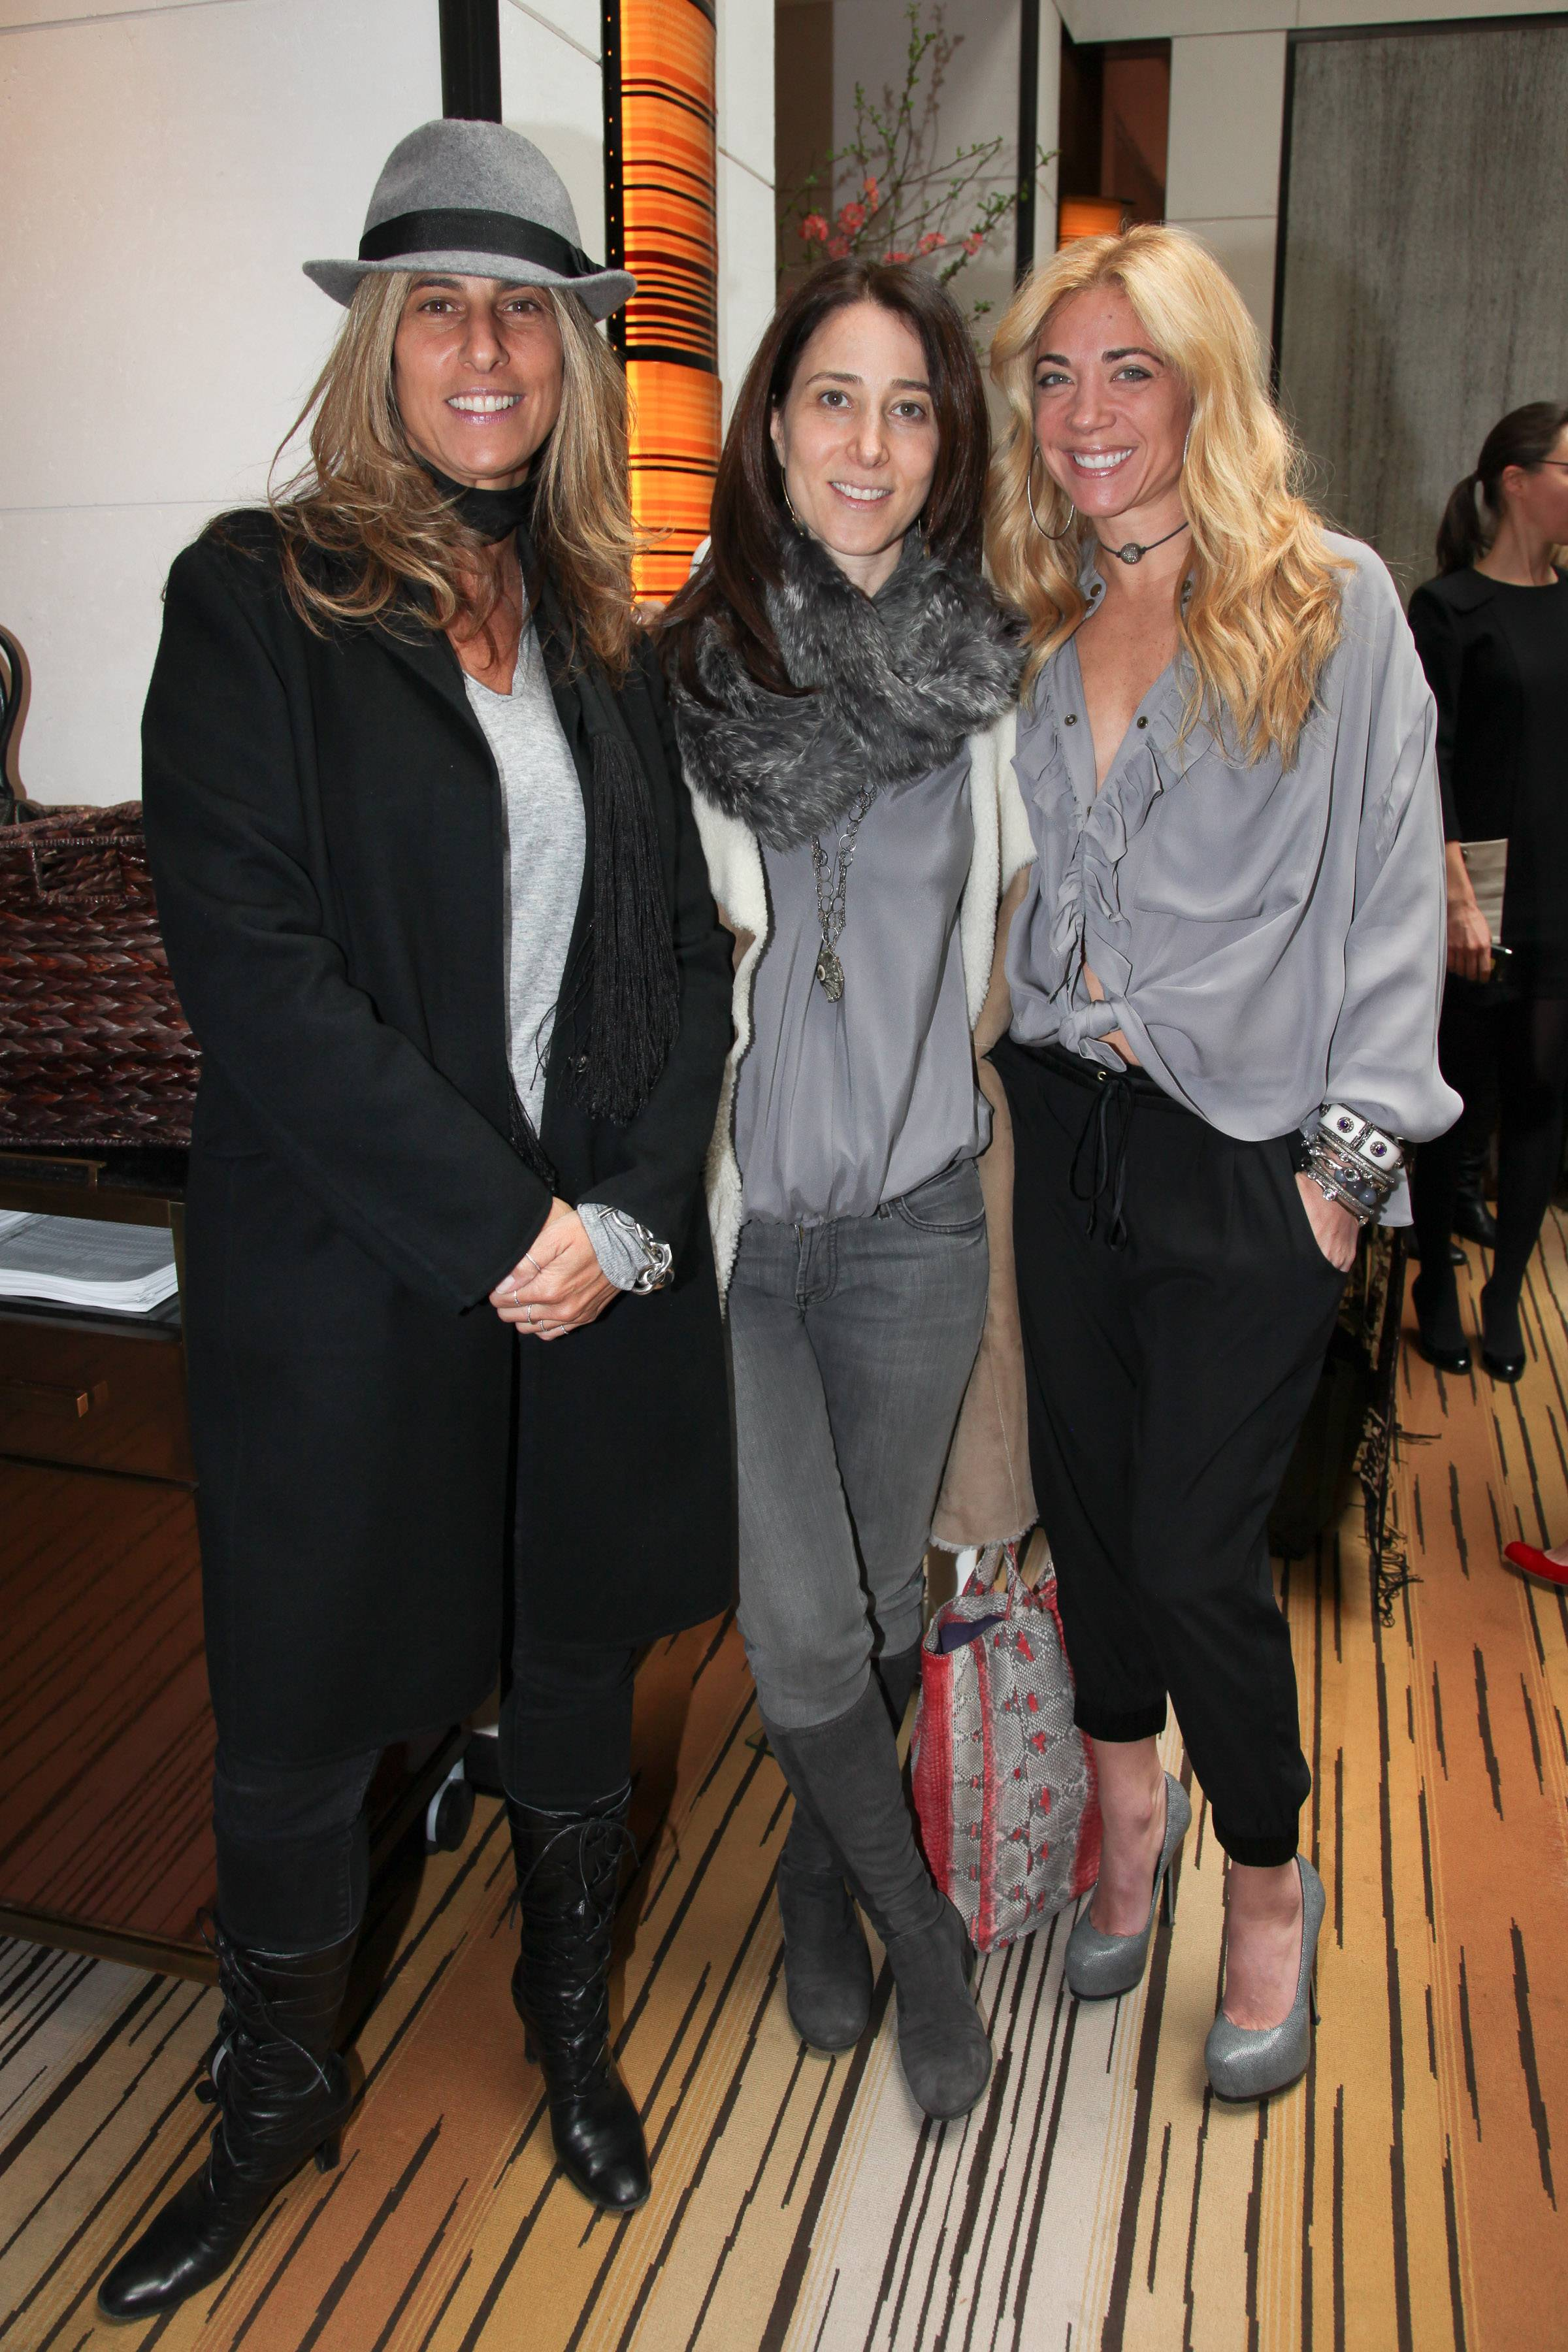 Kris Fuchs, Stacey Bronfman, Ramy Sharp    Theodora & Callum event benefitting Baby Buggy